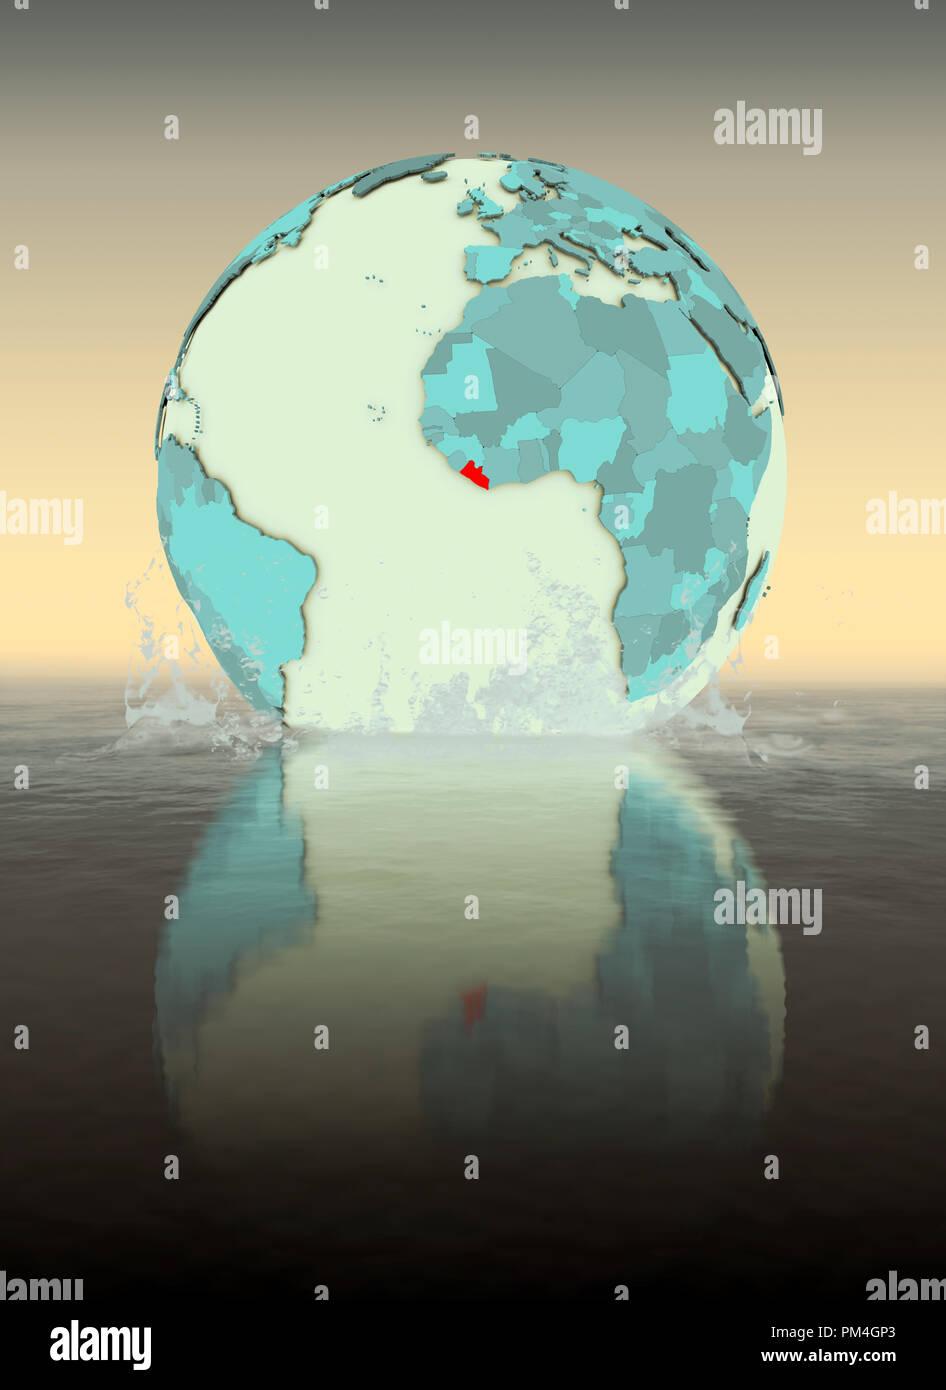 Liberia on globe splashed into the water. 3D illustration. - Stock Image